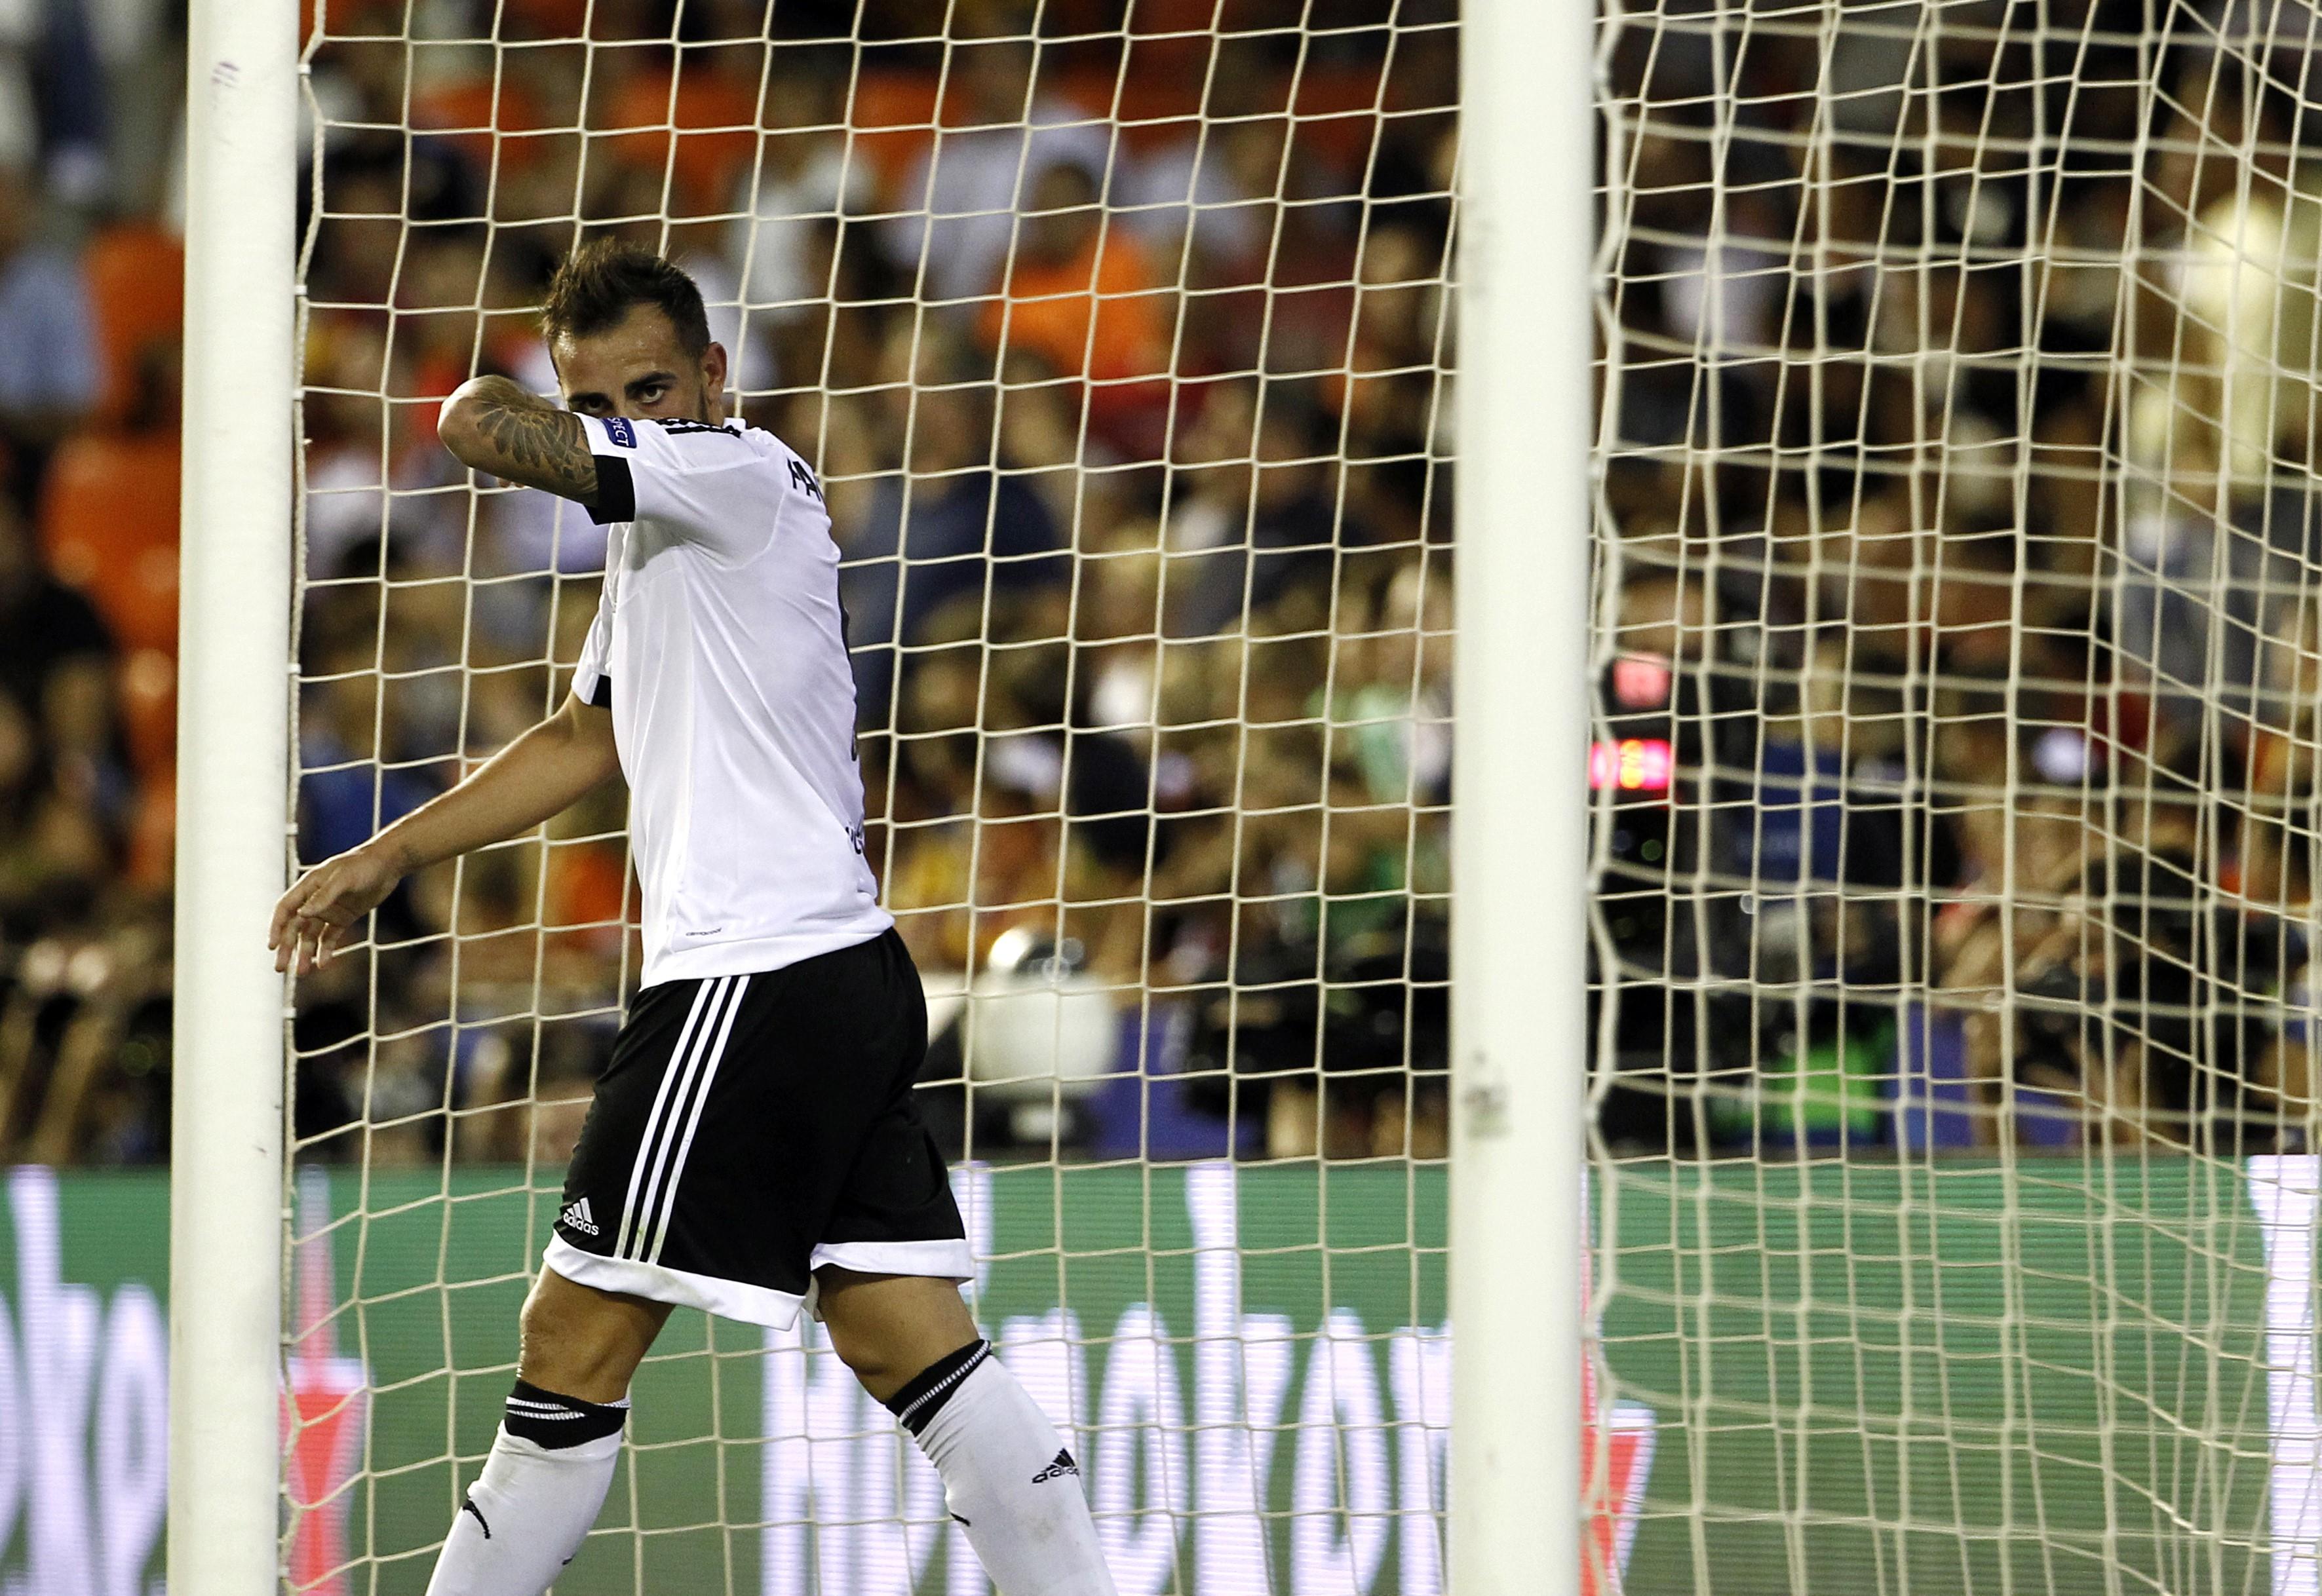 Valencia's forward Paco Alcacer gestures